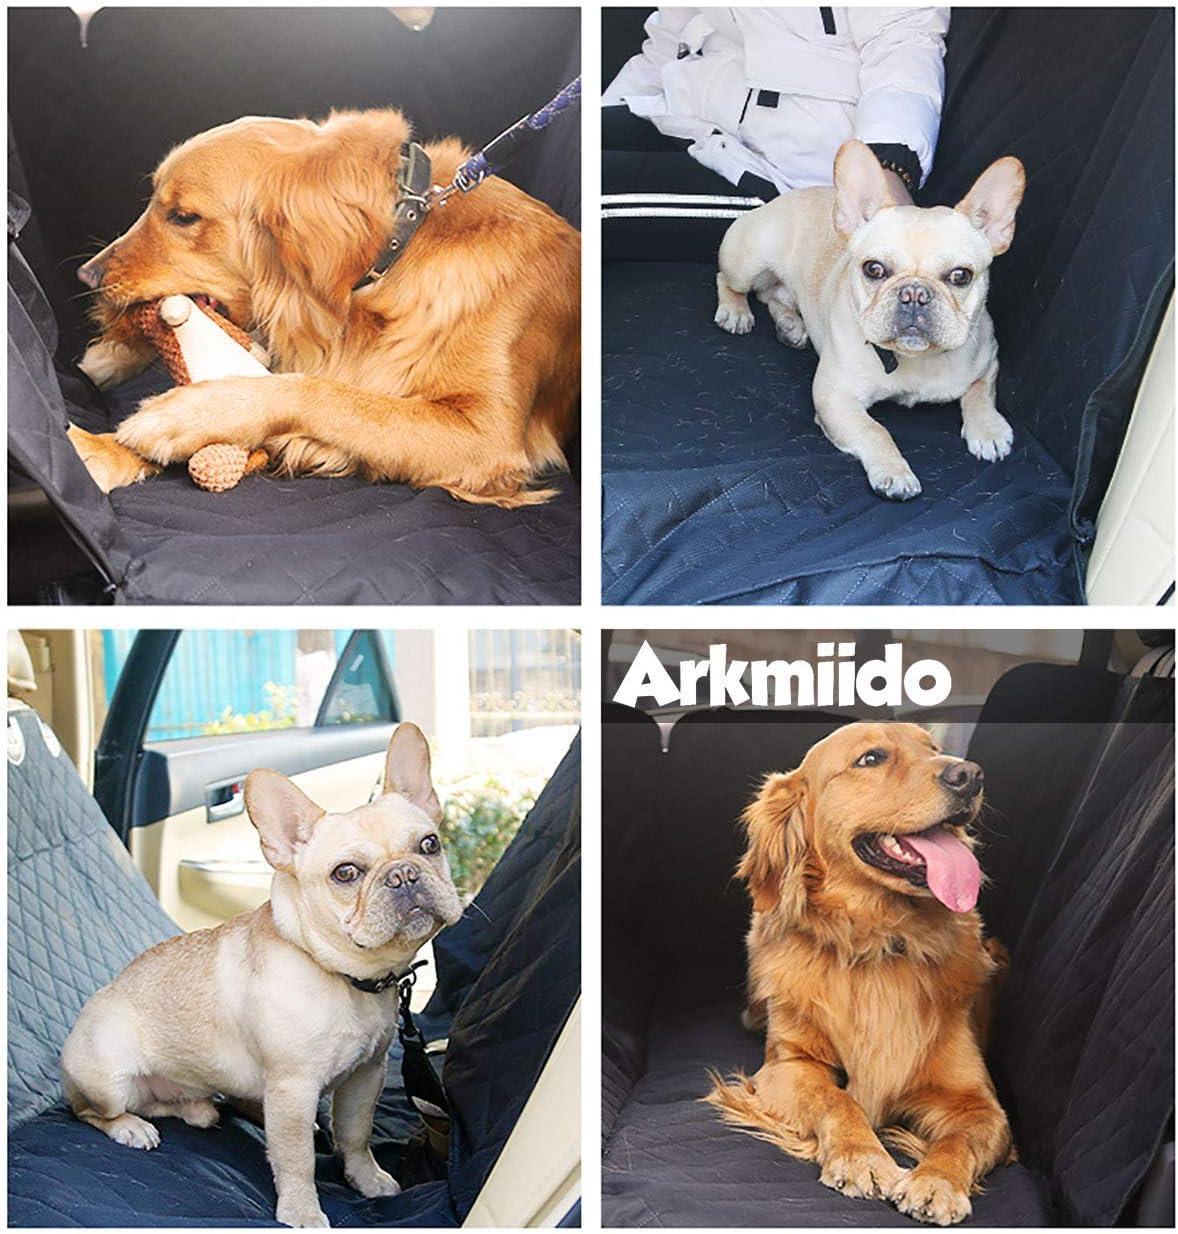 Arkmiido Hundedecke Auto f/ür R/ückbank,Wasserdicht Waschbar,Autoschondecke f/ür R/ückbank,137x147 cm